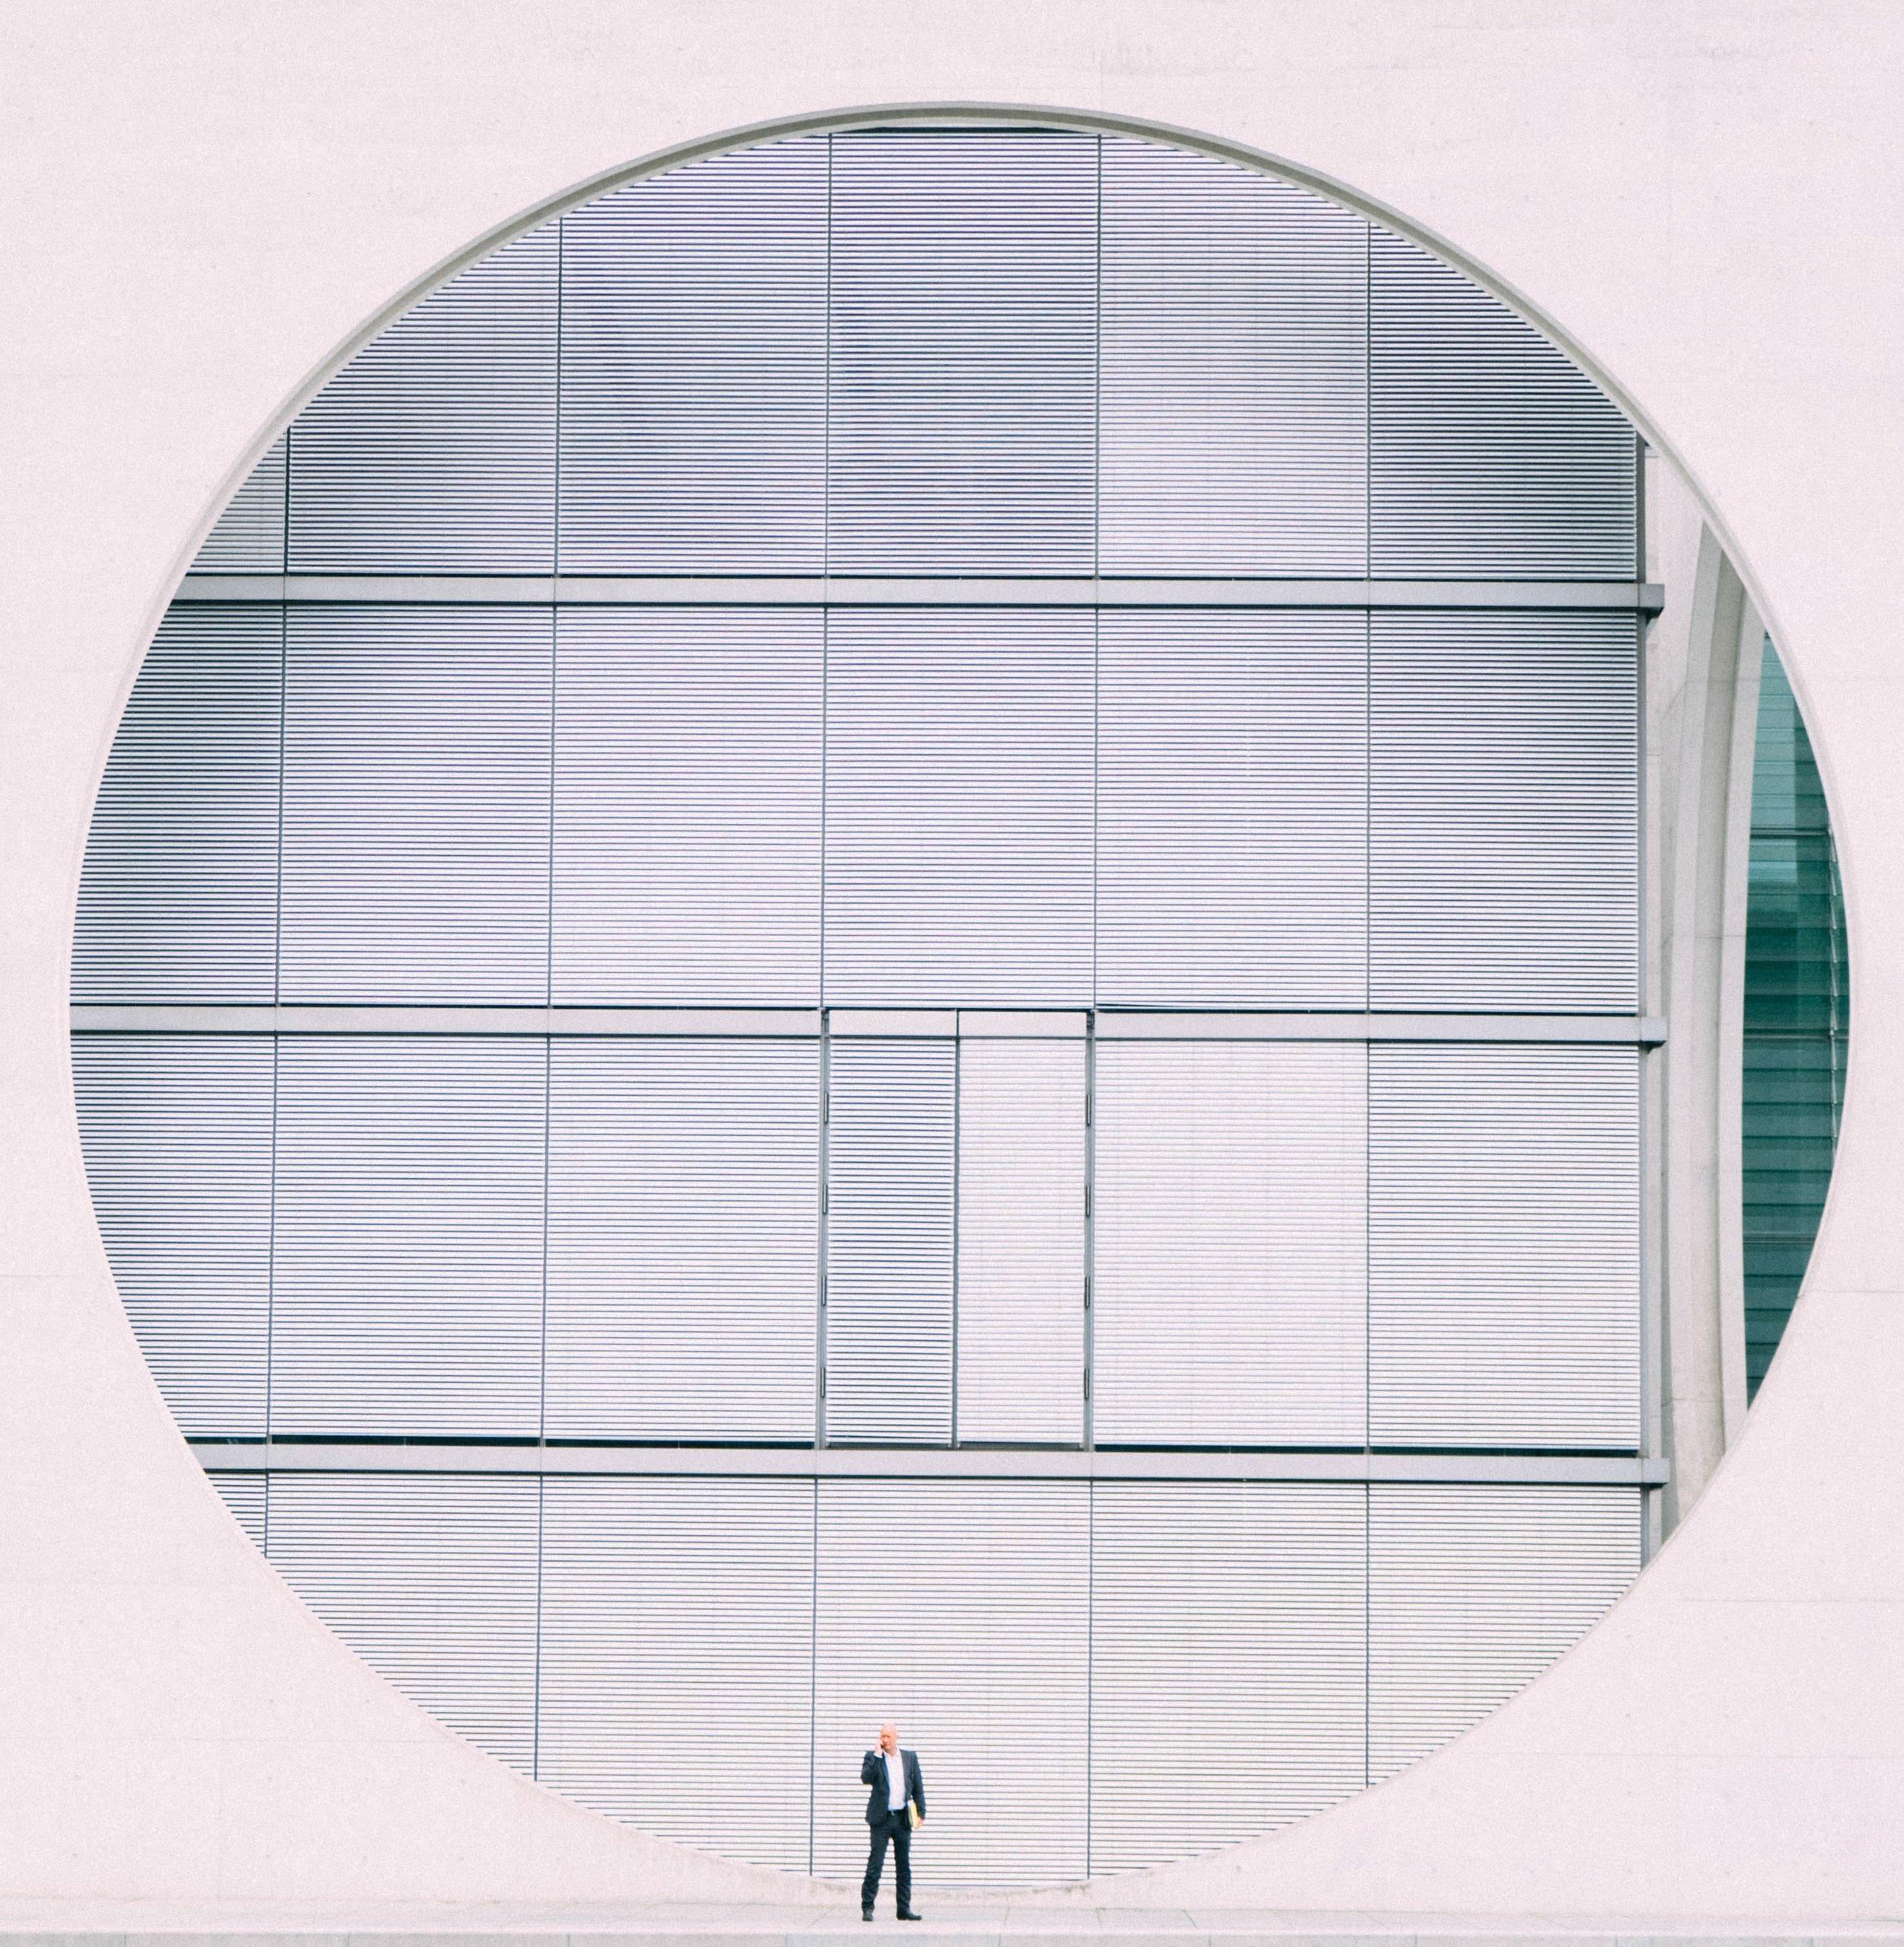 architectural-design-architecture-berlin-1295485.jpg